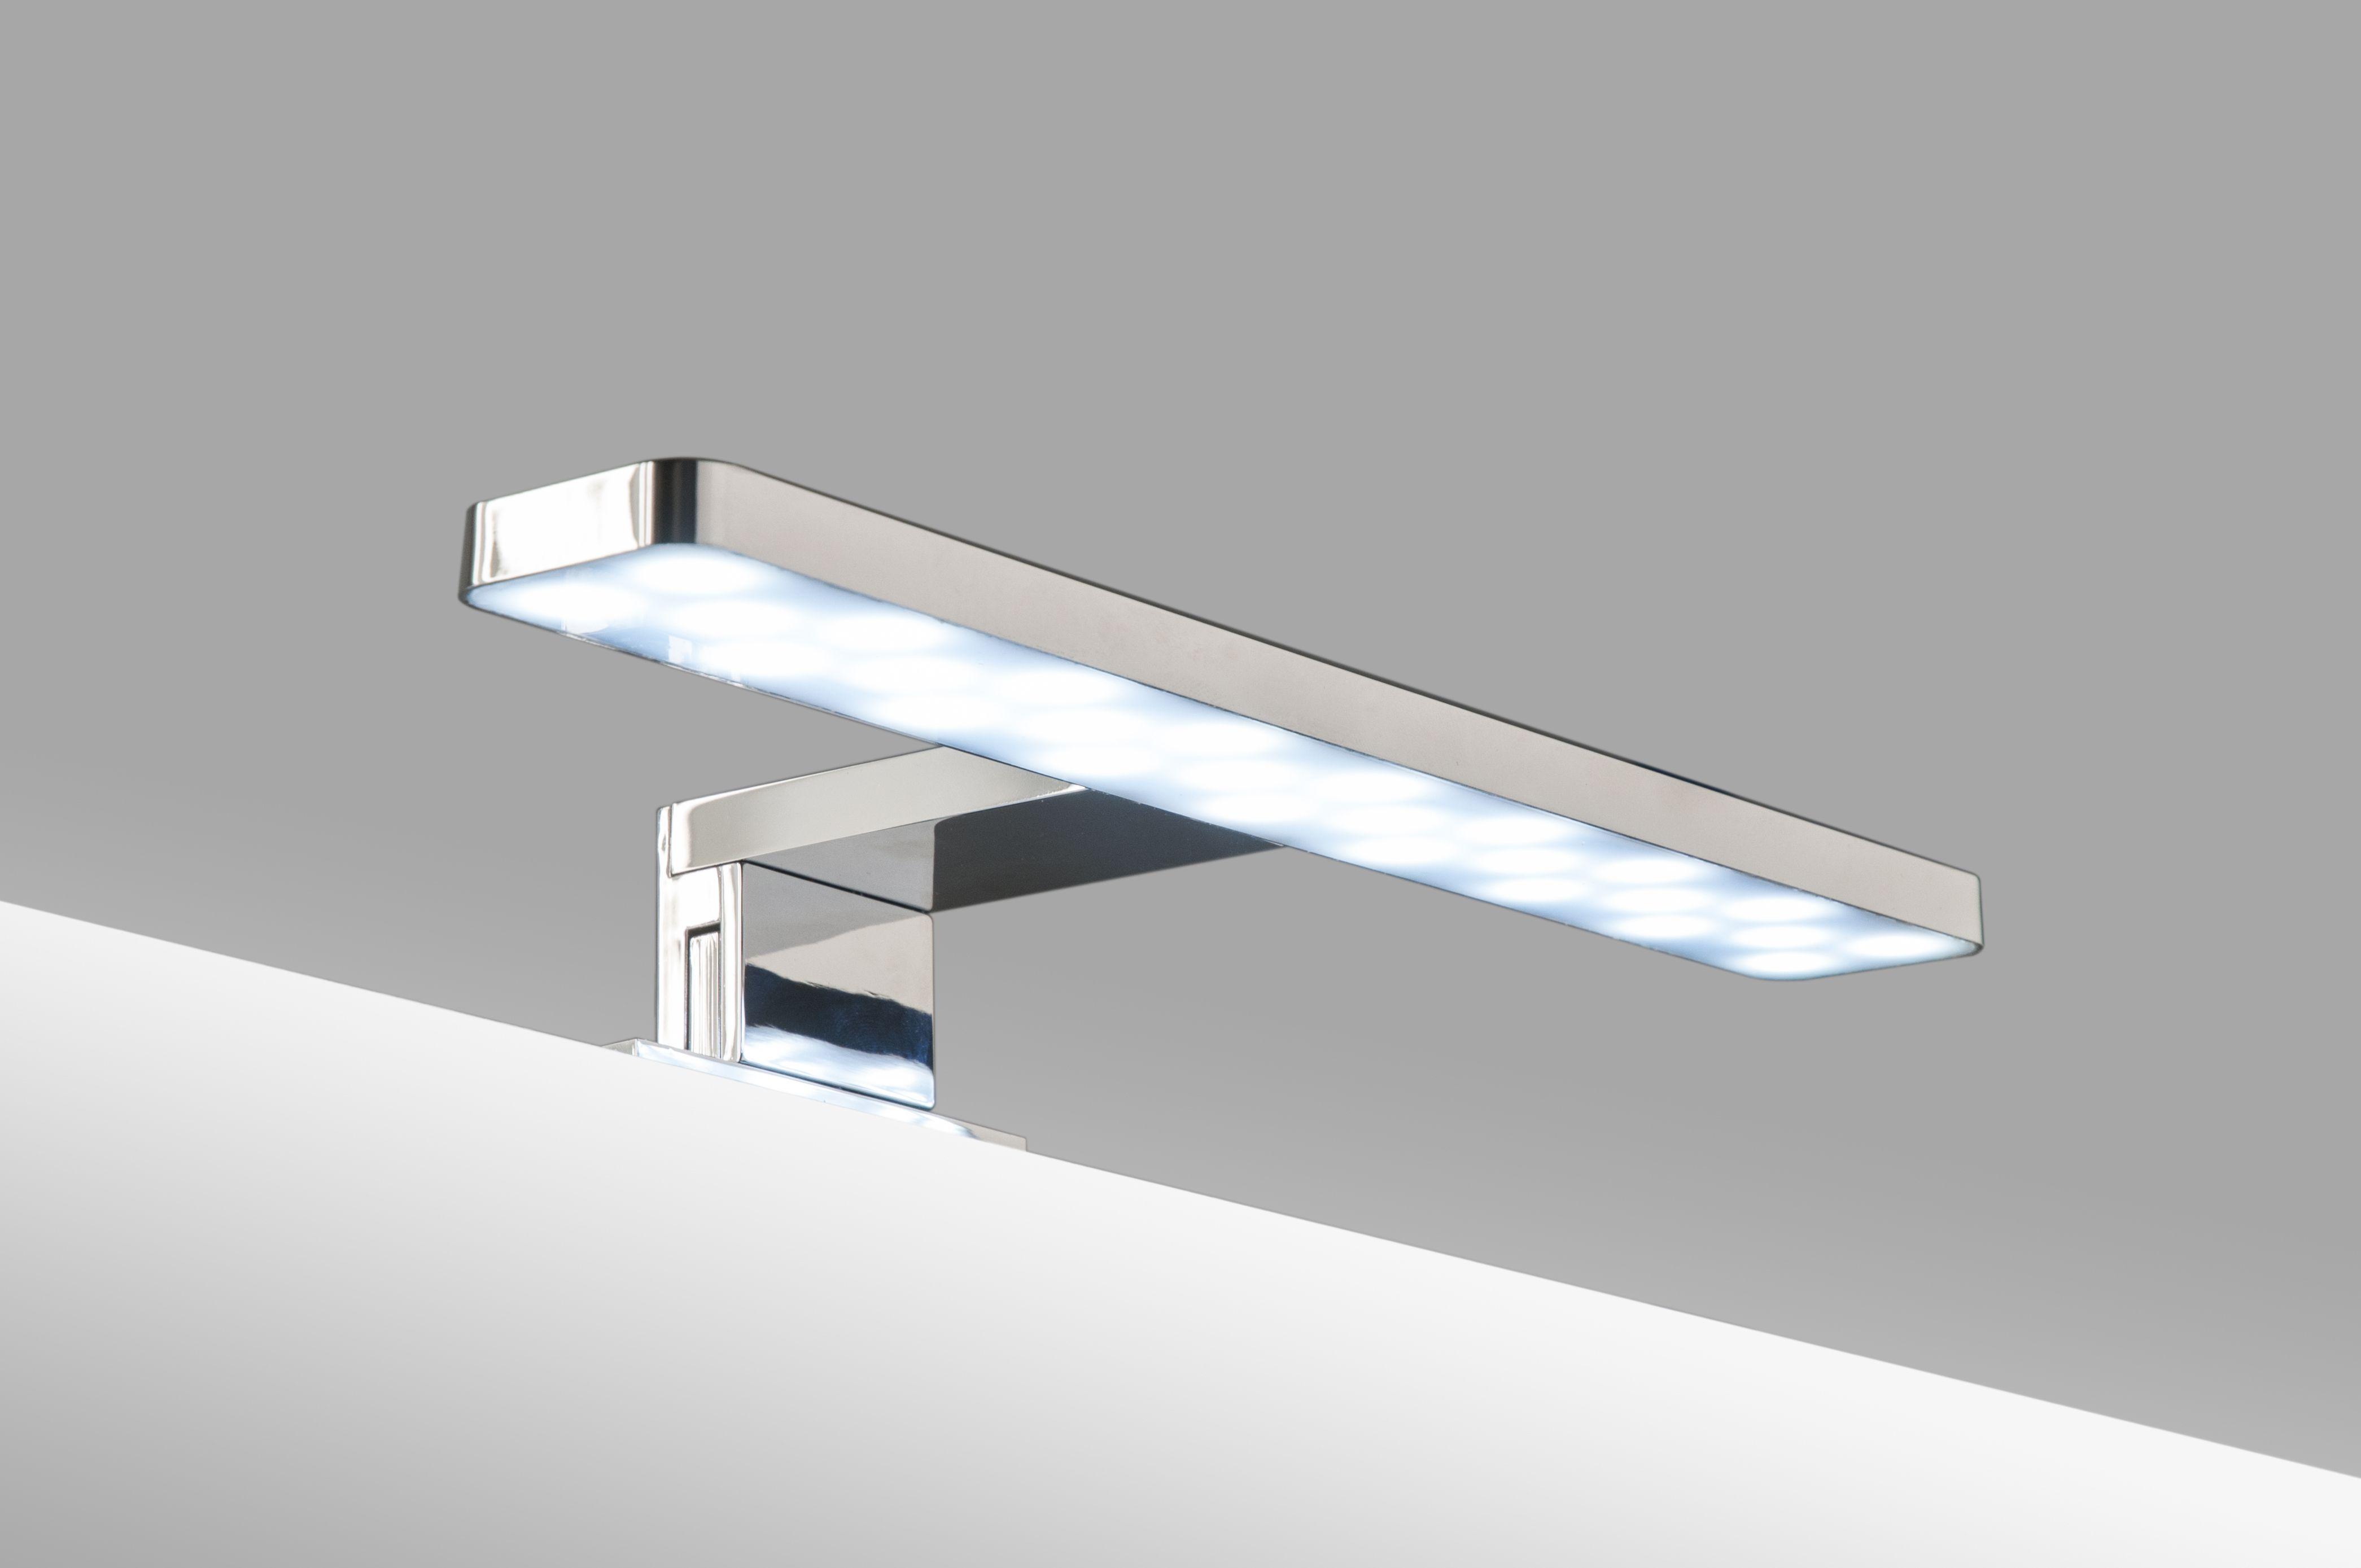 Foco led para tu espejo de 28 cm. Consumo 5.5 W. Luz